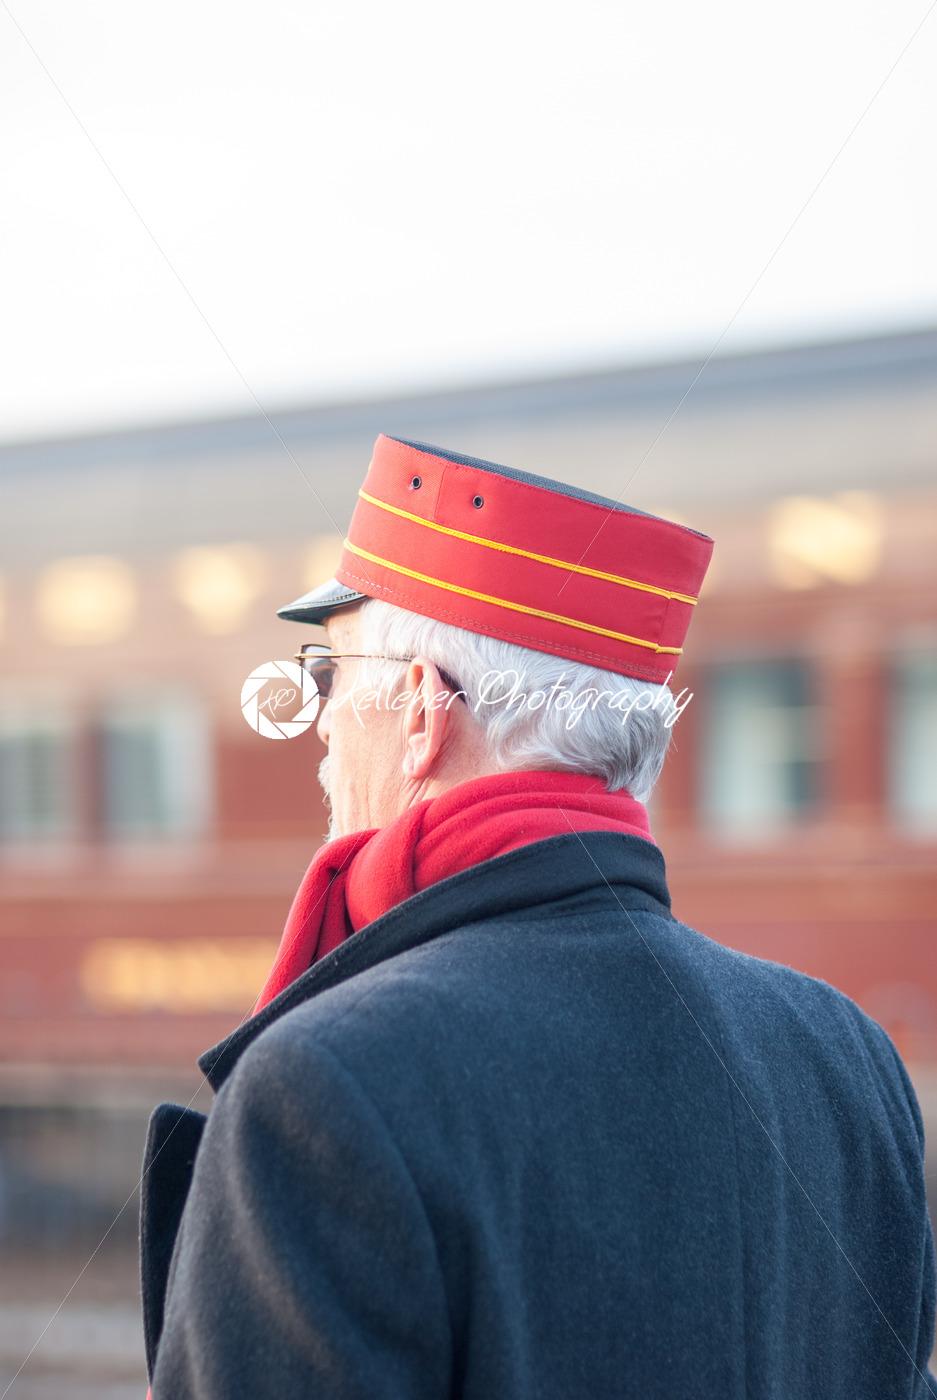 STRASBURG, PA – DECEMBER 15: Conductor standing watching Steam Locomotive in Strasburg, Pennsylvania on December 15, 2012 - Kelleher Photography Store